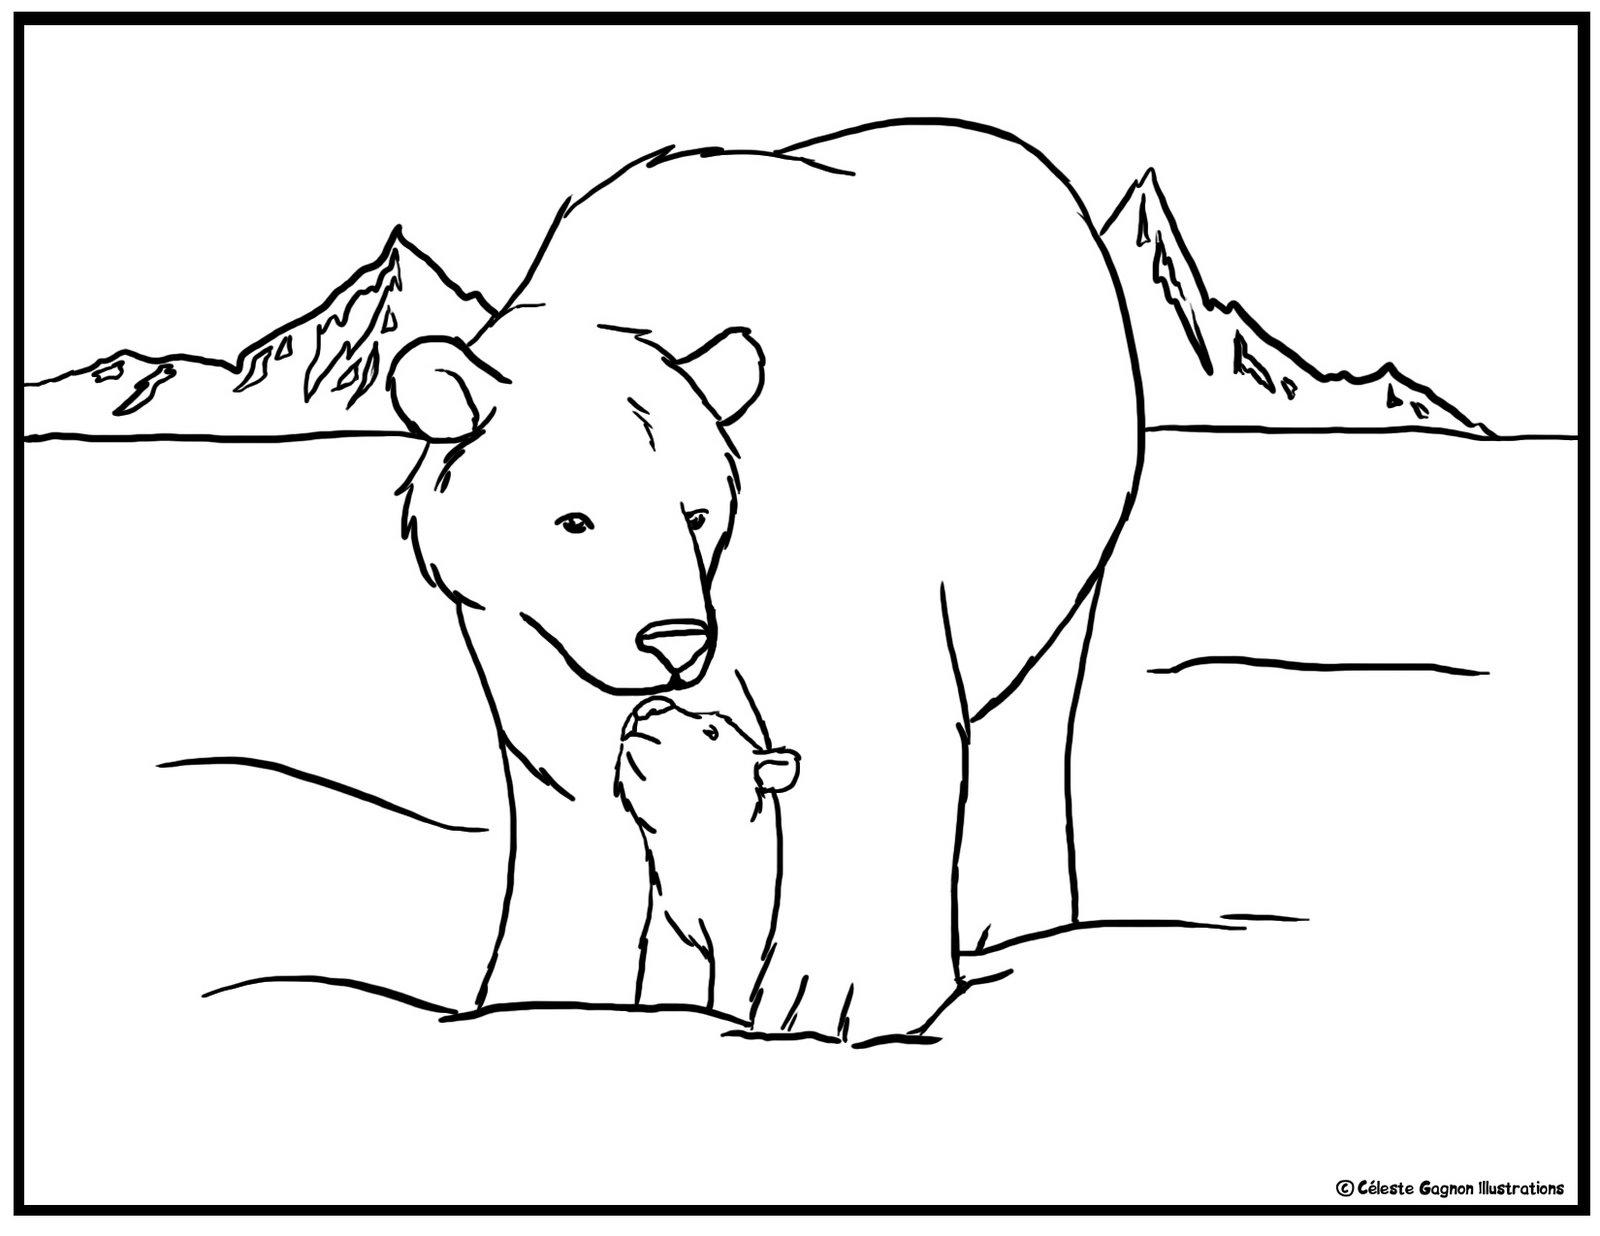 polar bear coloring pages - Polar Bear Crafts DLTK's Crafts for Kids